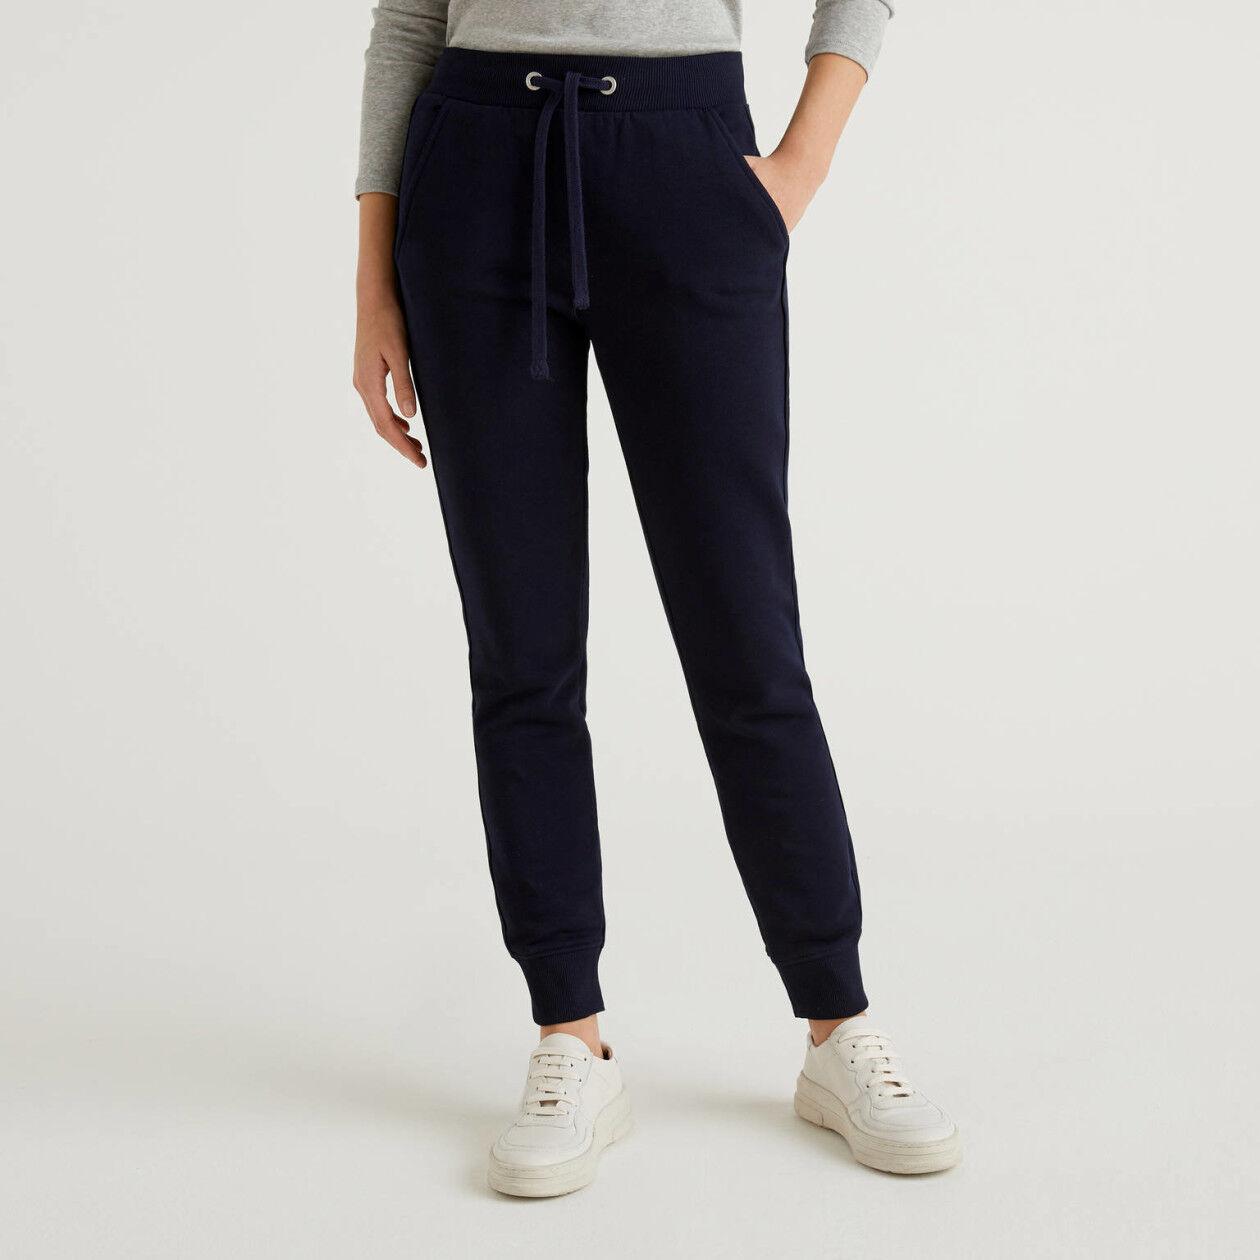 Pantalon en molleton avec cordon de serrage